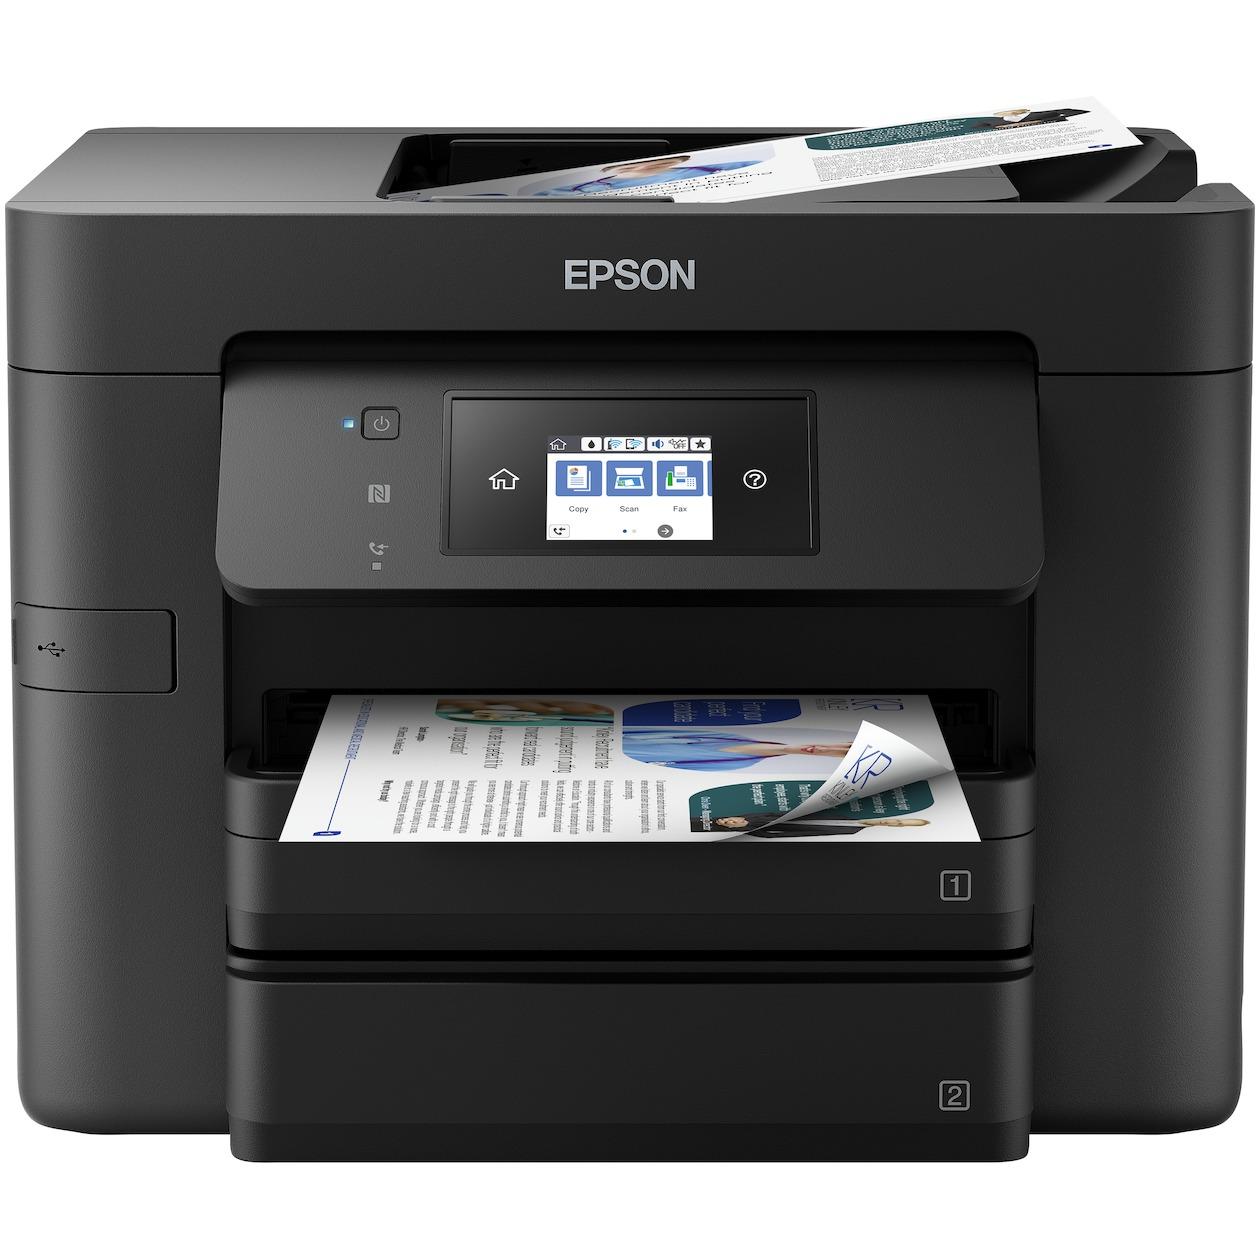 Epson WorkForce WF-4730DTWF printer